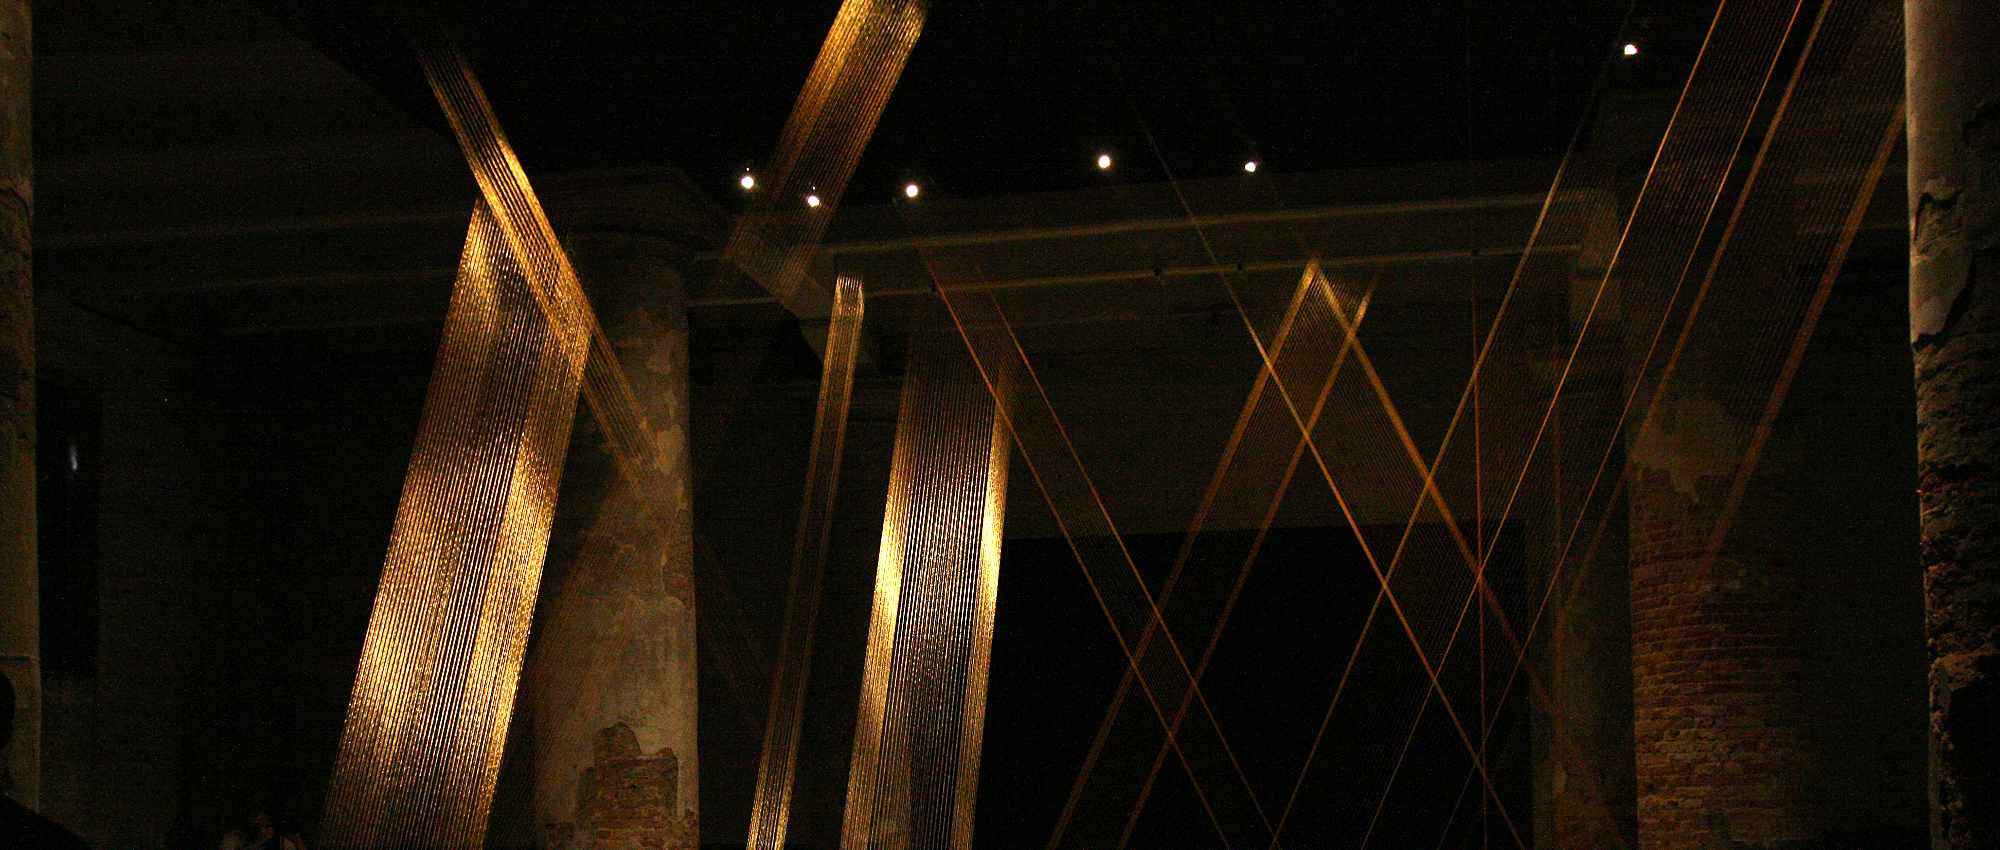 Venice Biennale 2009